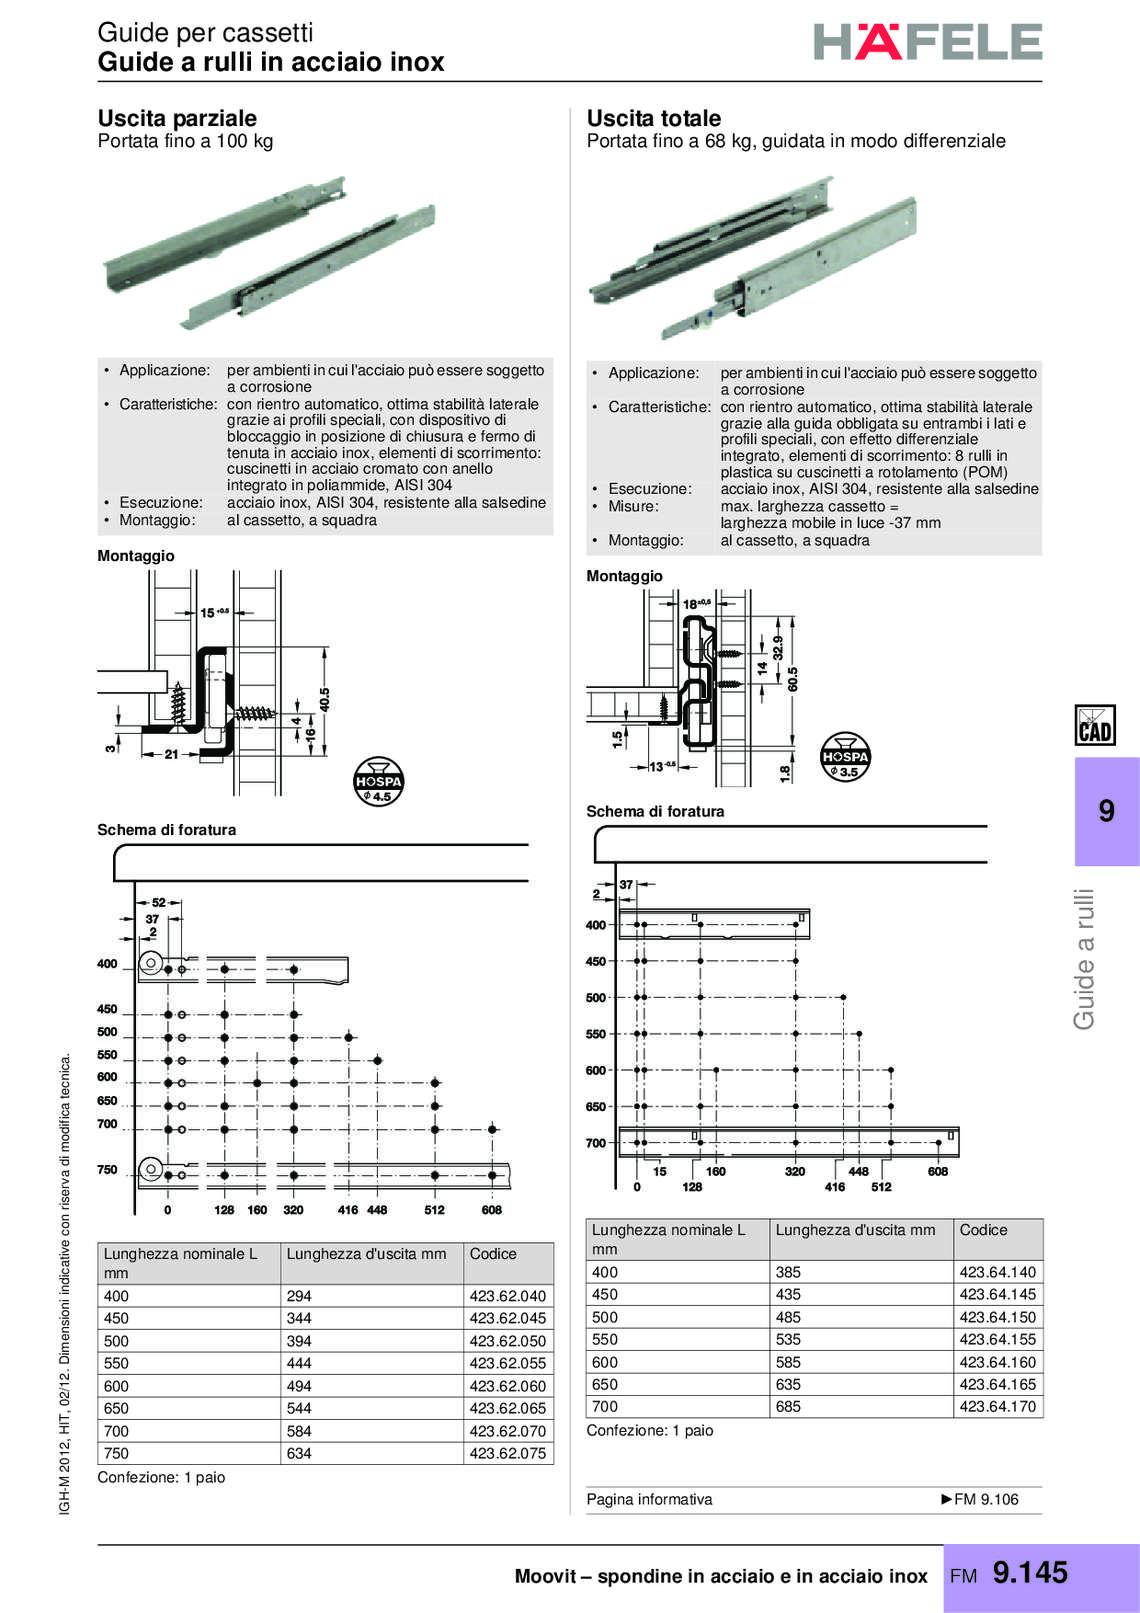 hafele-spondine-e-guide-per-mobili_40_204.jpg